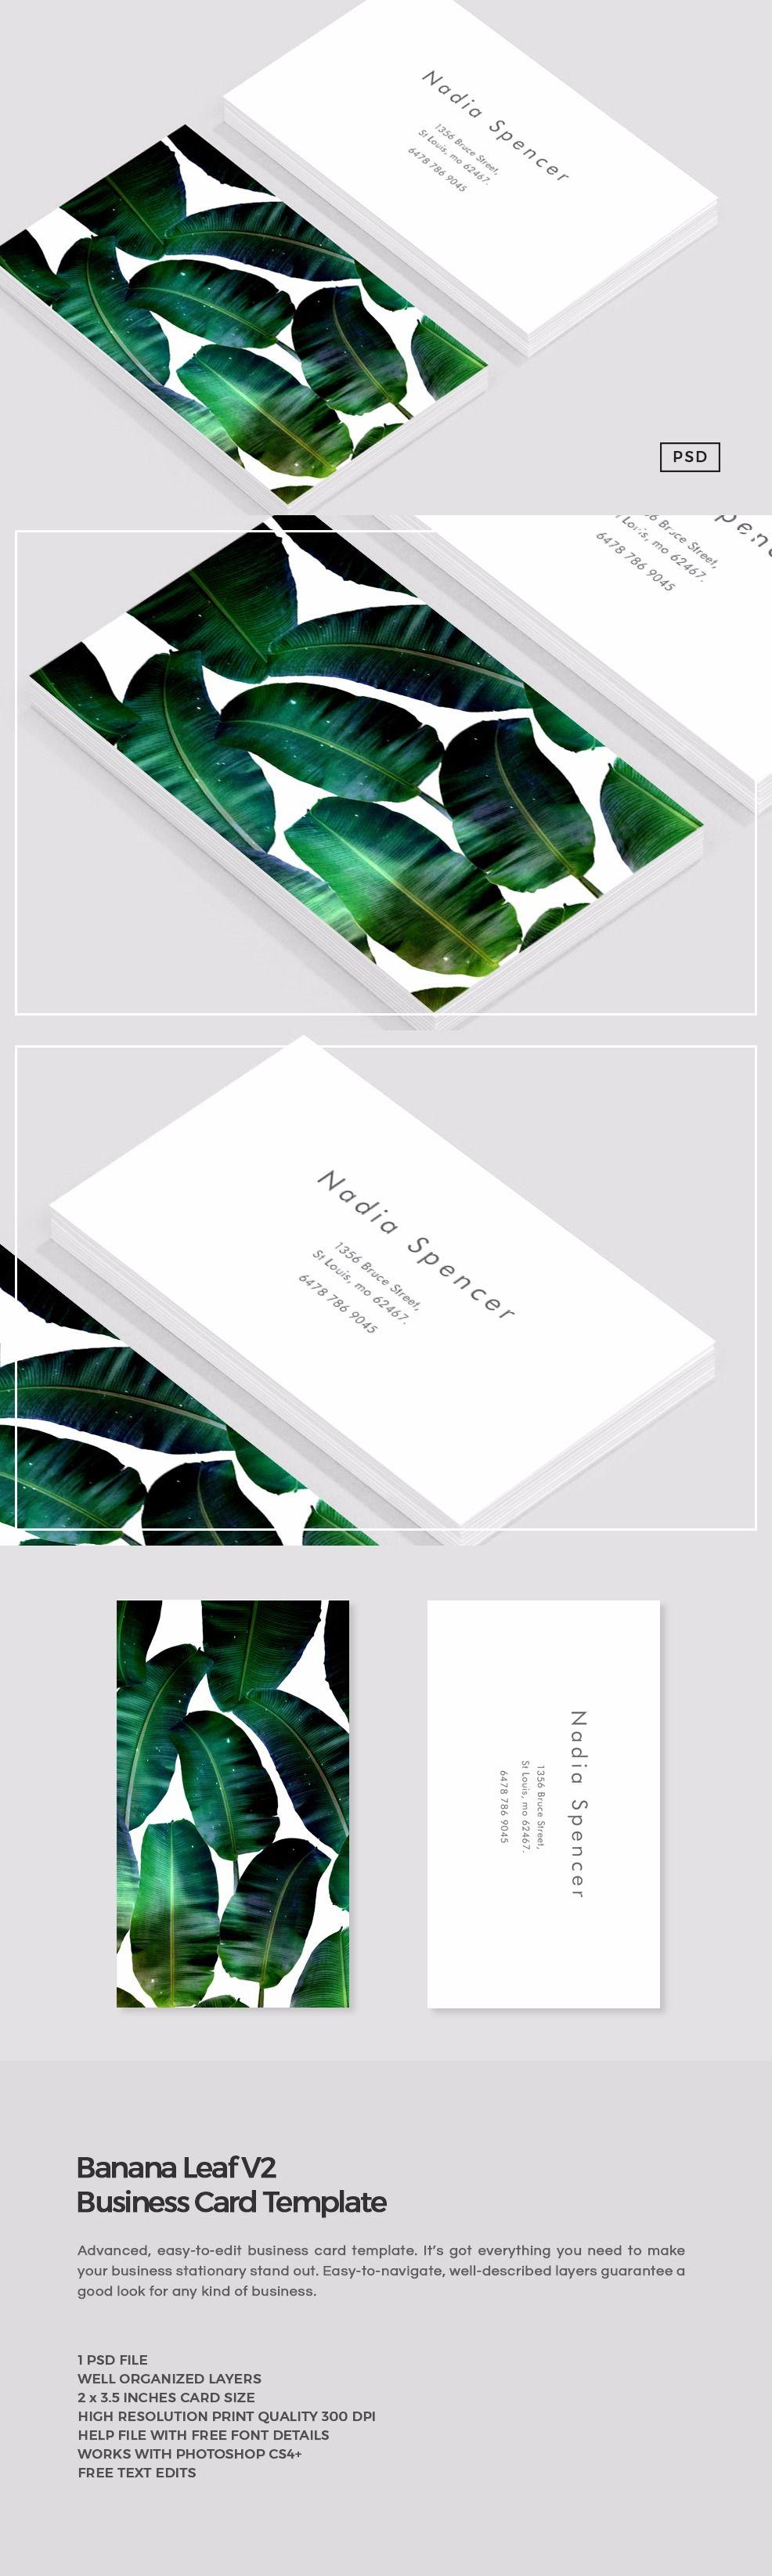 Banana Leaf Business Card Template Business Card Template Business Card Template Design Business Card Design